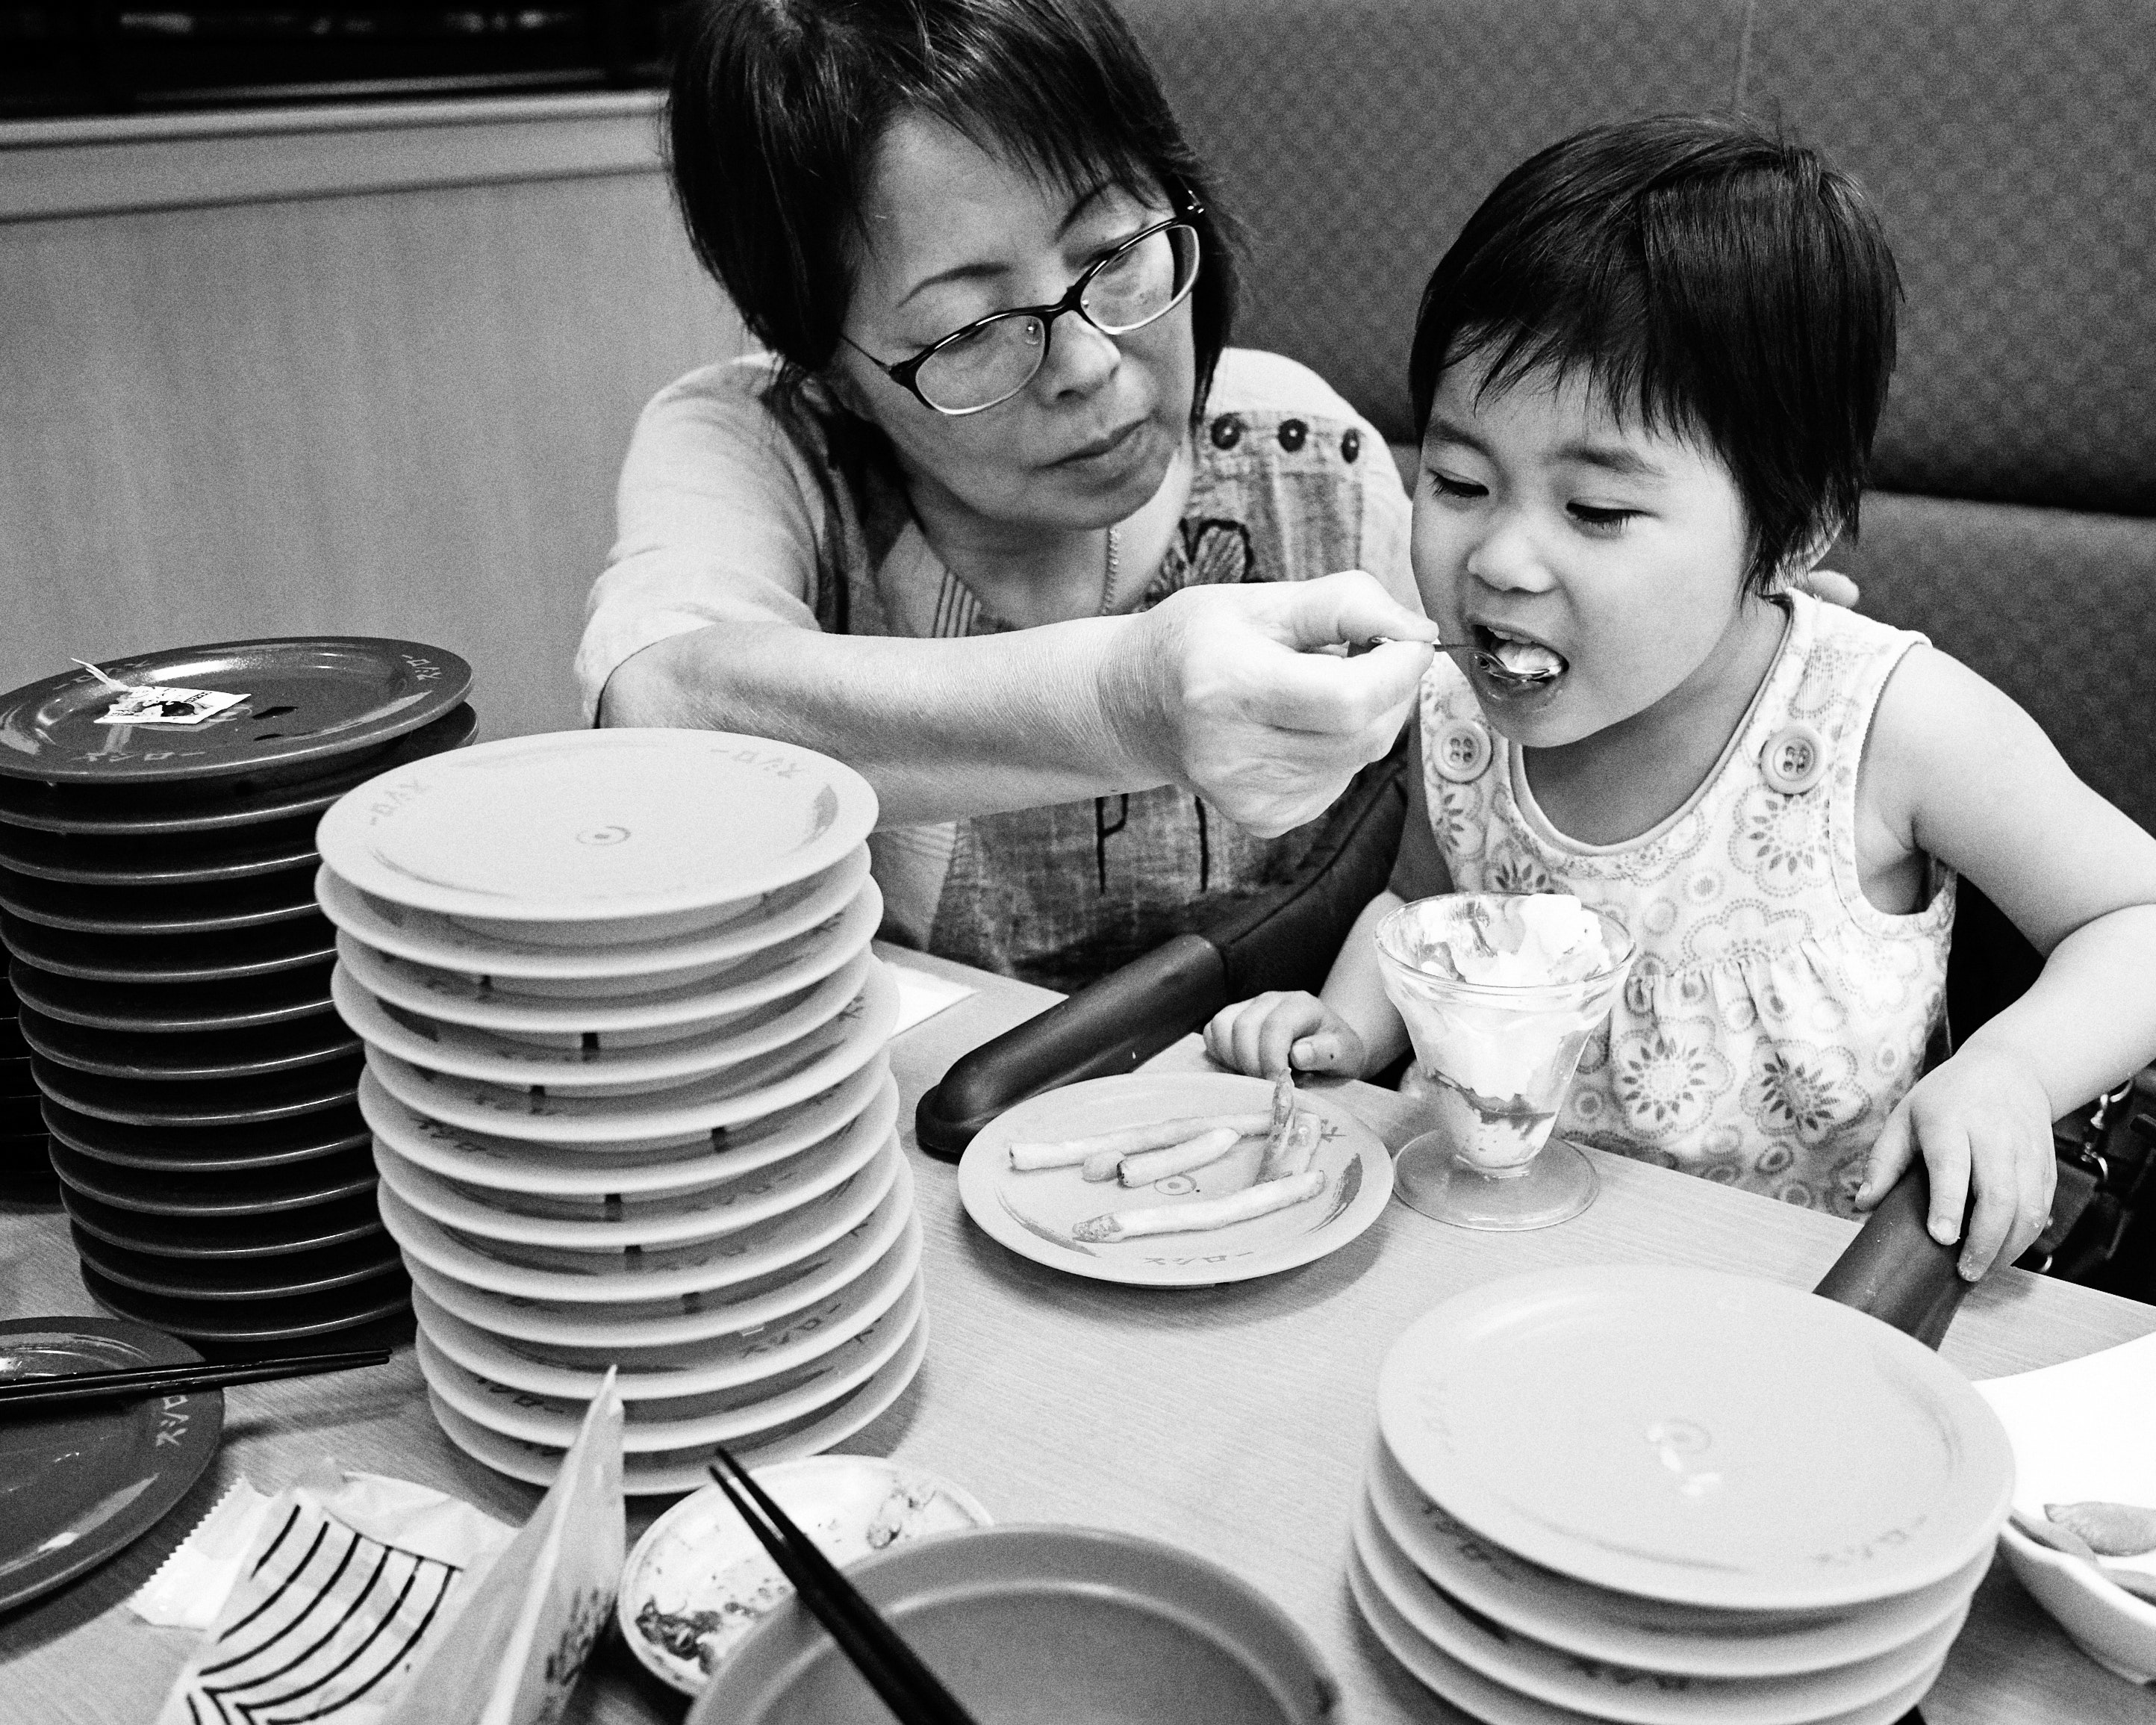 dinner at sushiro plates